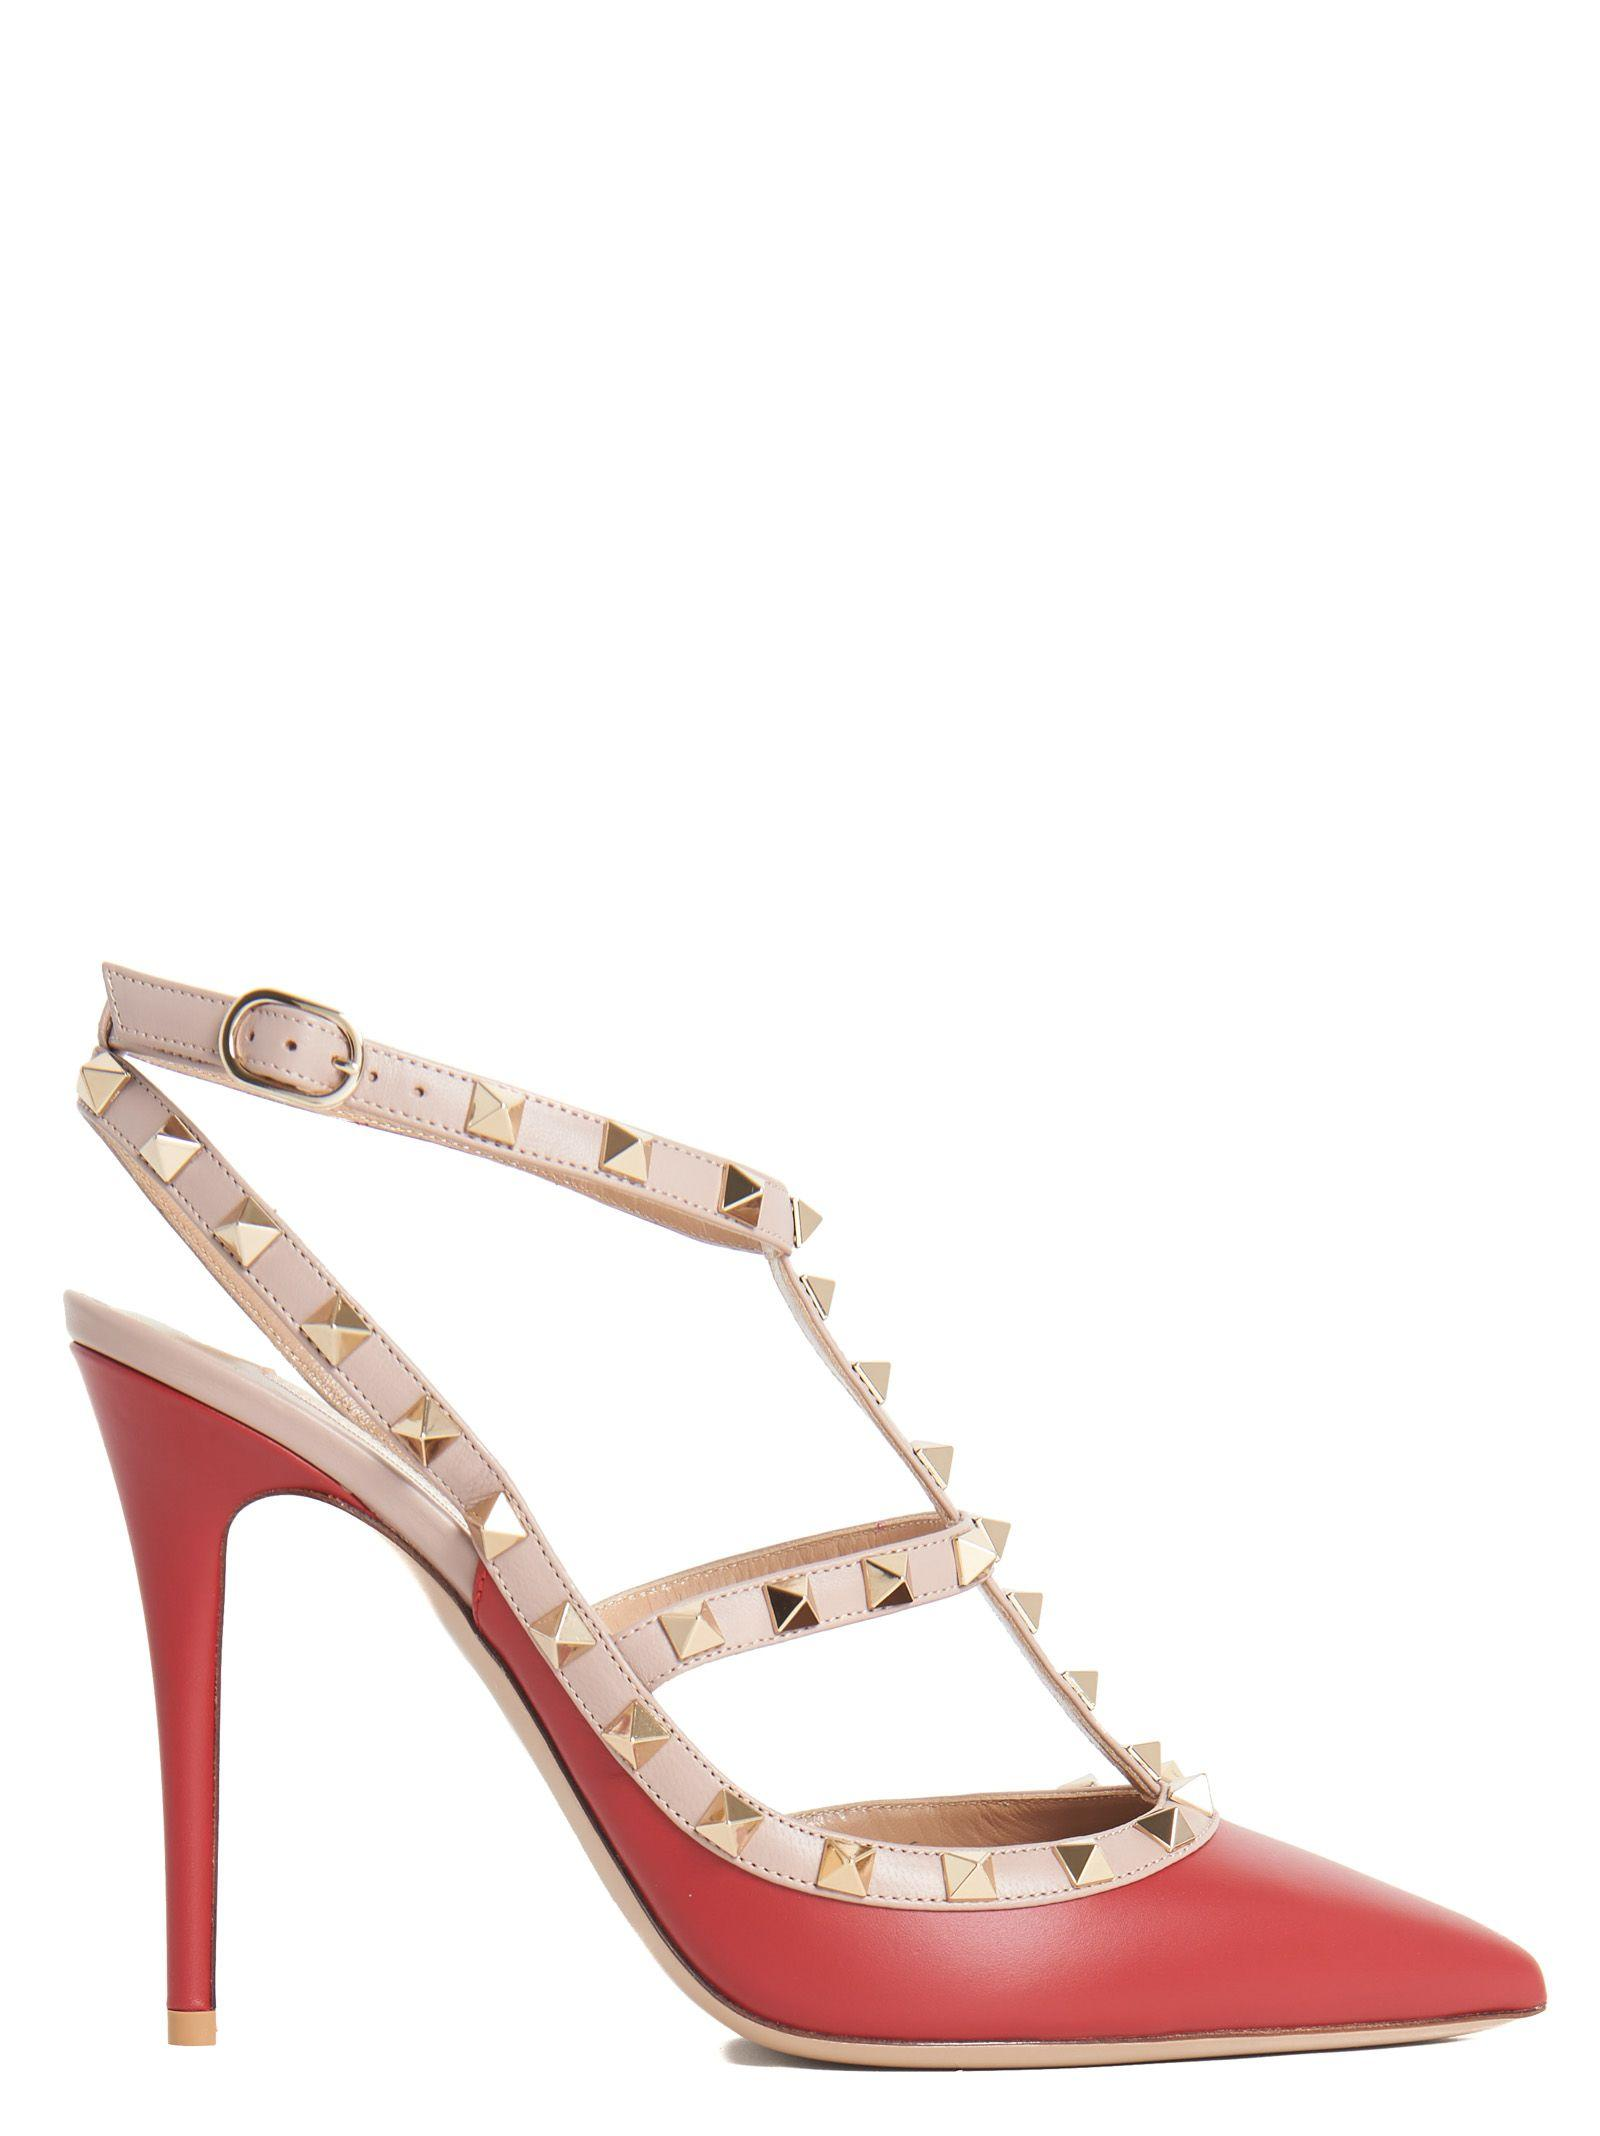 Valentino Decollette In Red